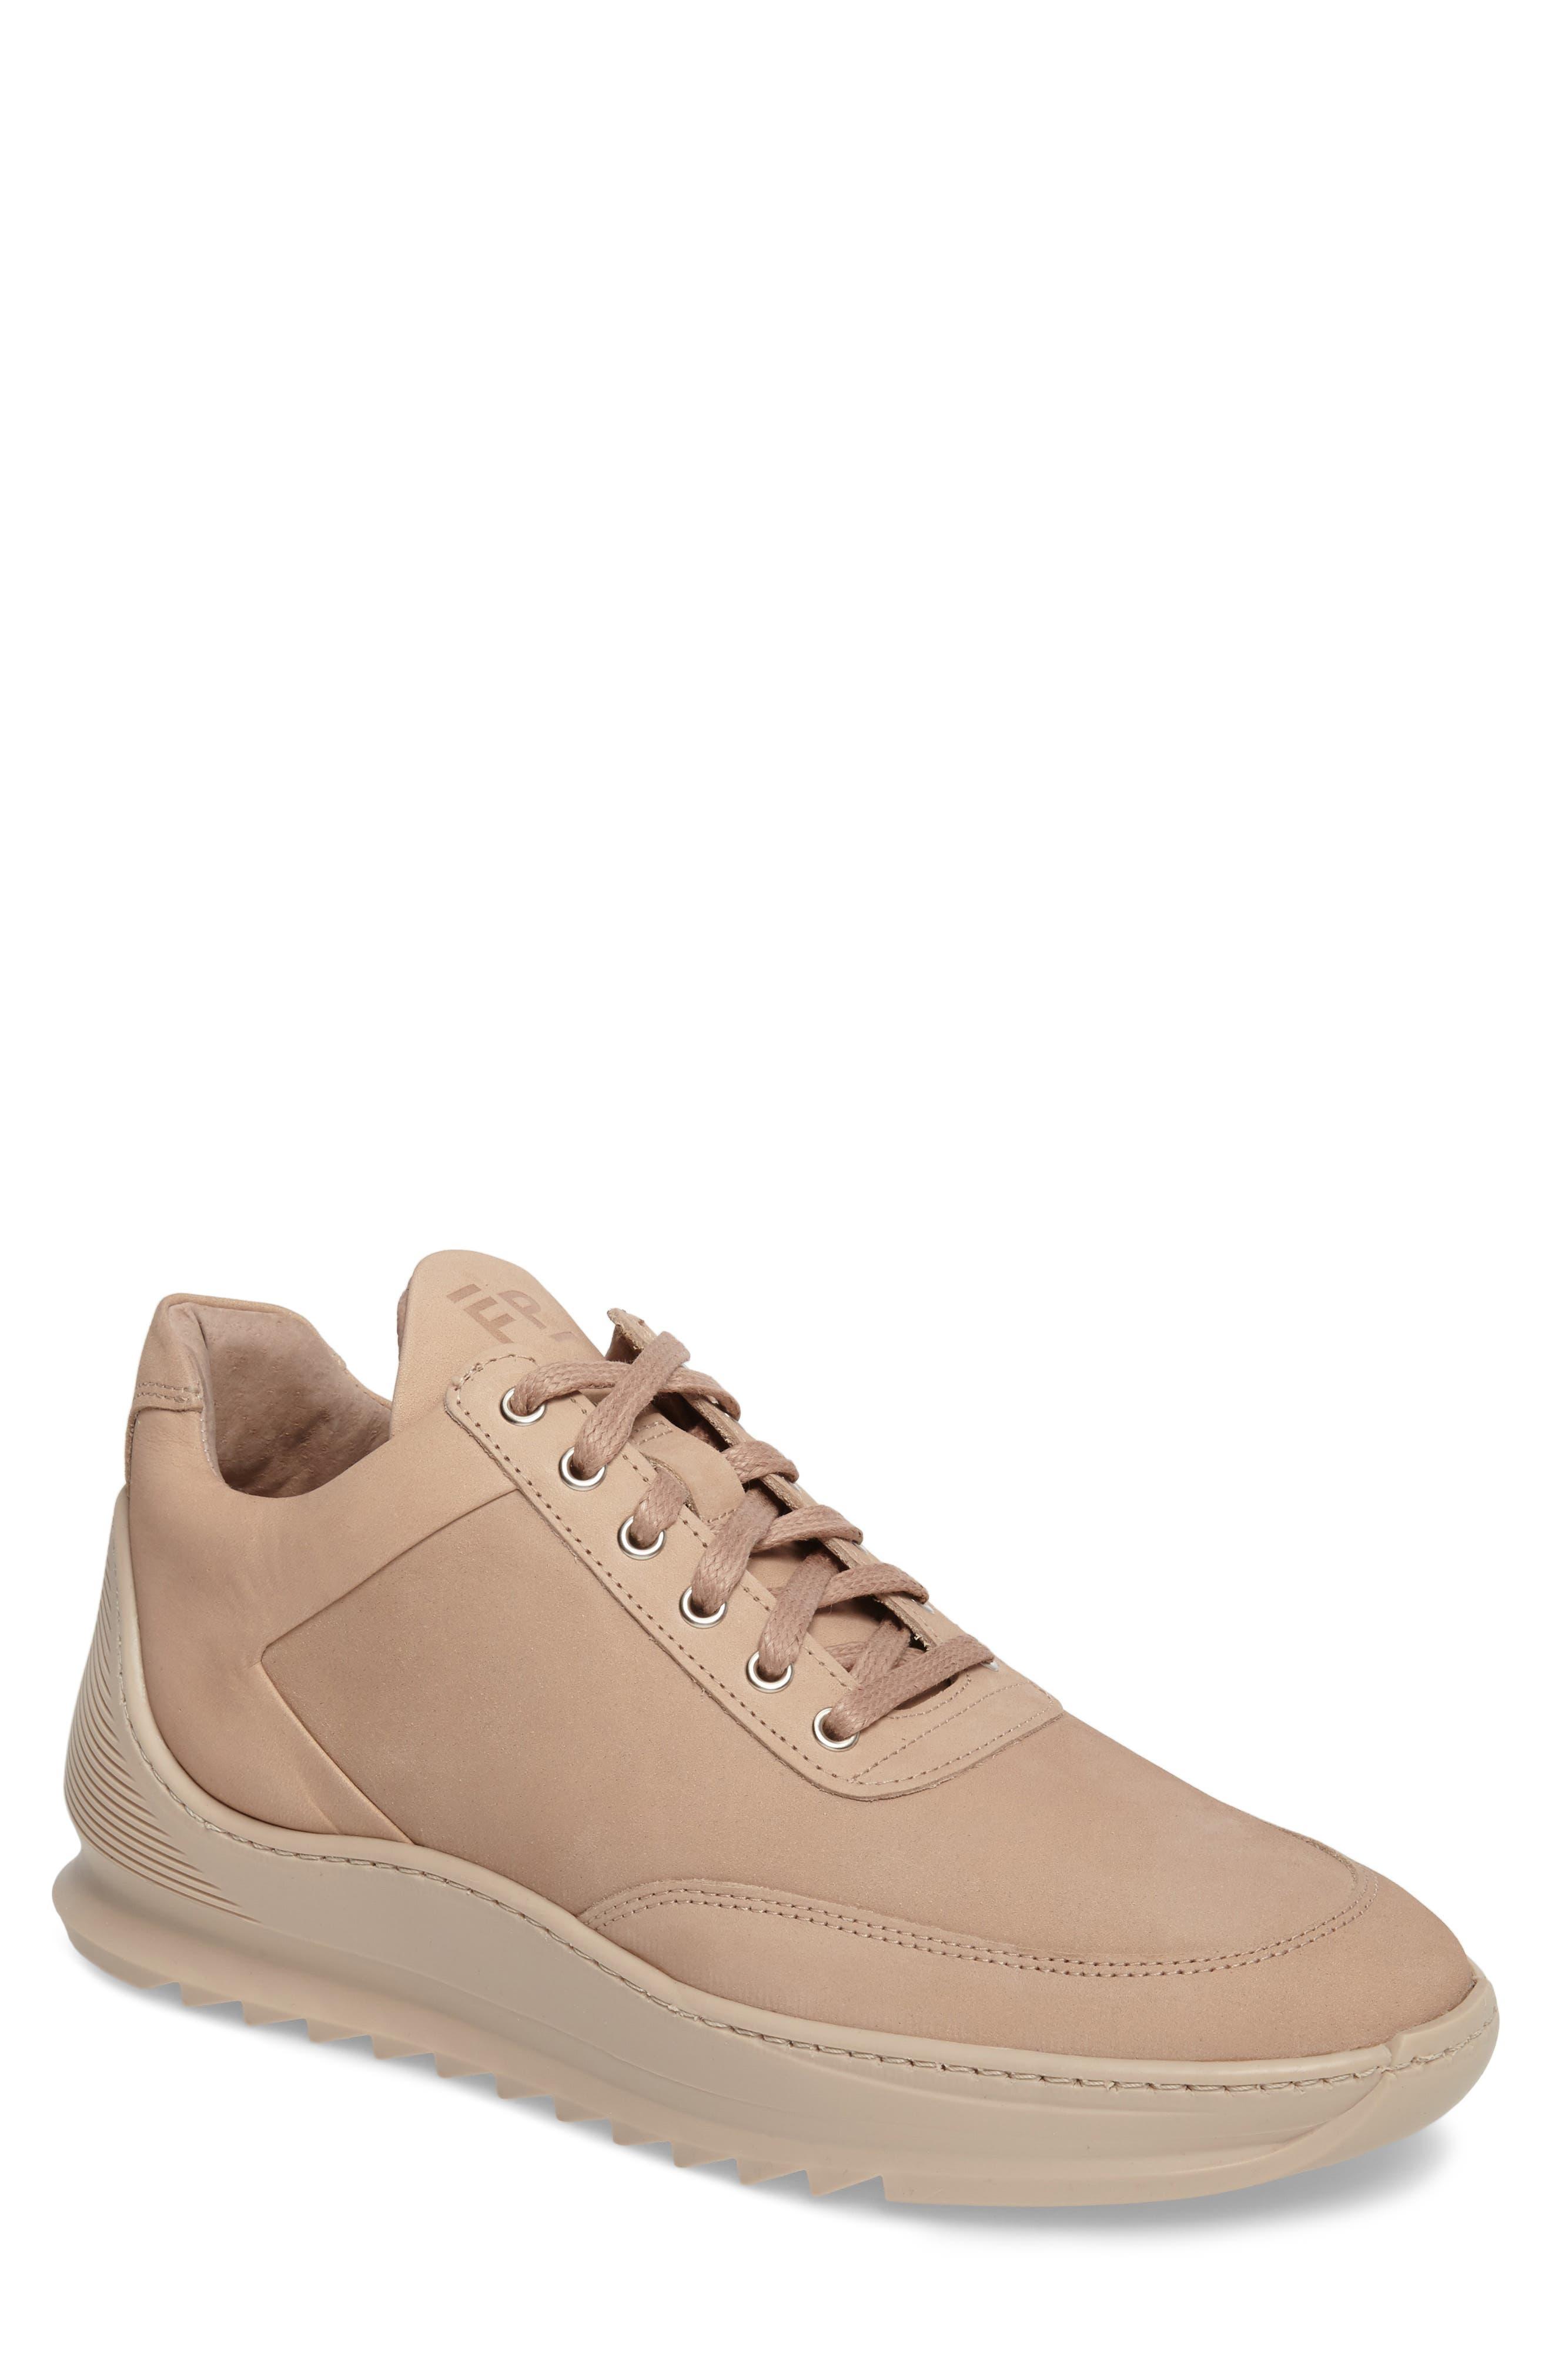 Main Image - Filling Pieces Low-Top Sneaker (Men)